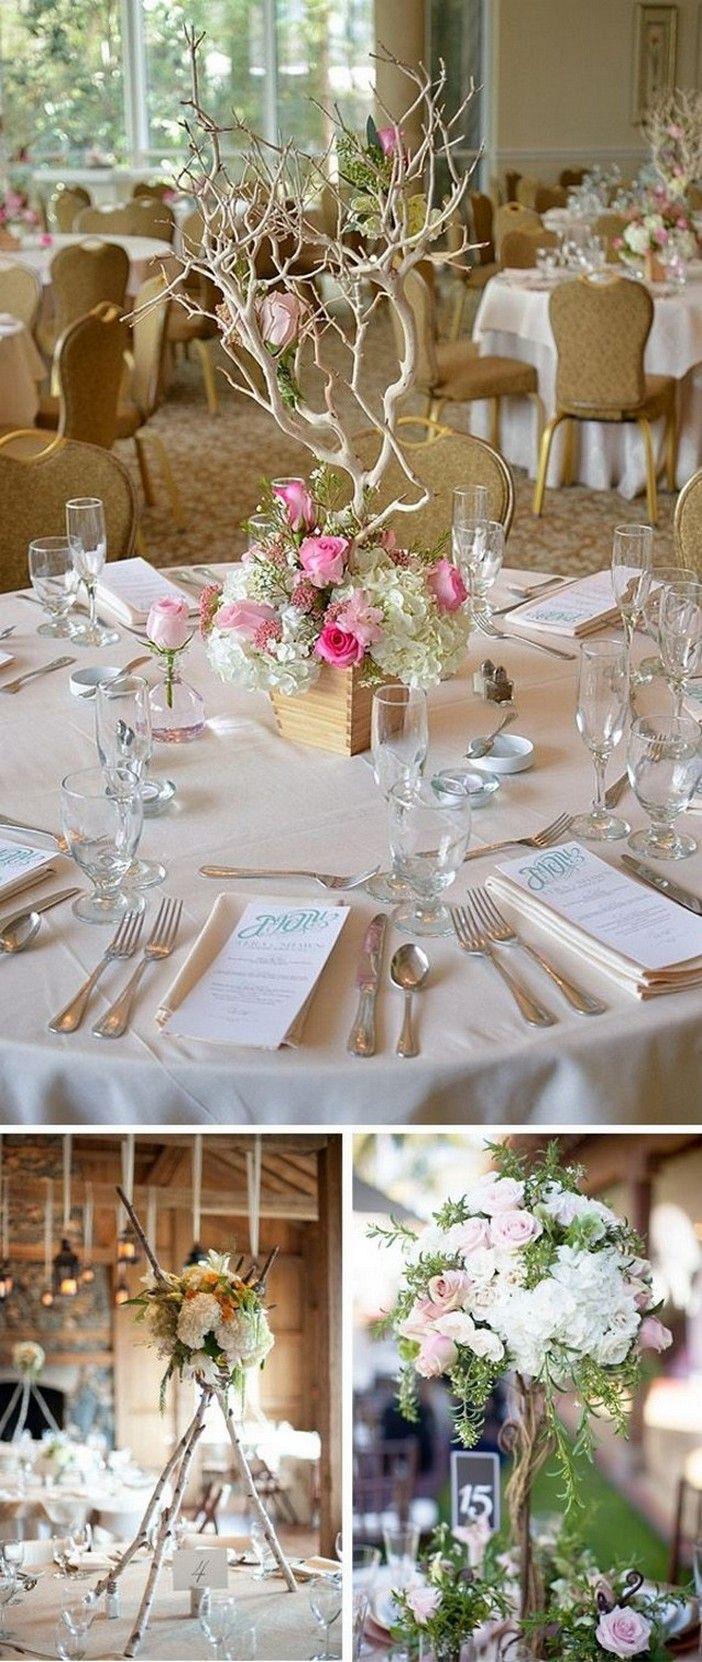 centros de mesa para 15 anos economicos 5 wedding in 2018 rh pinterest com